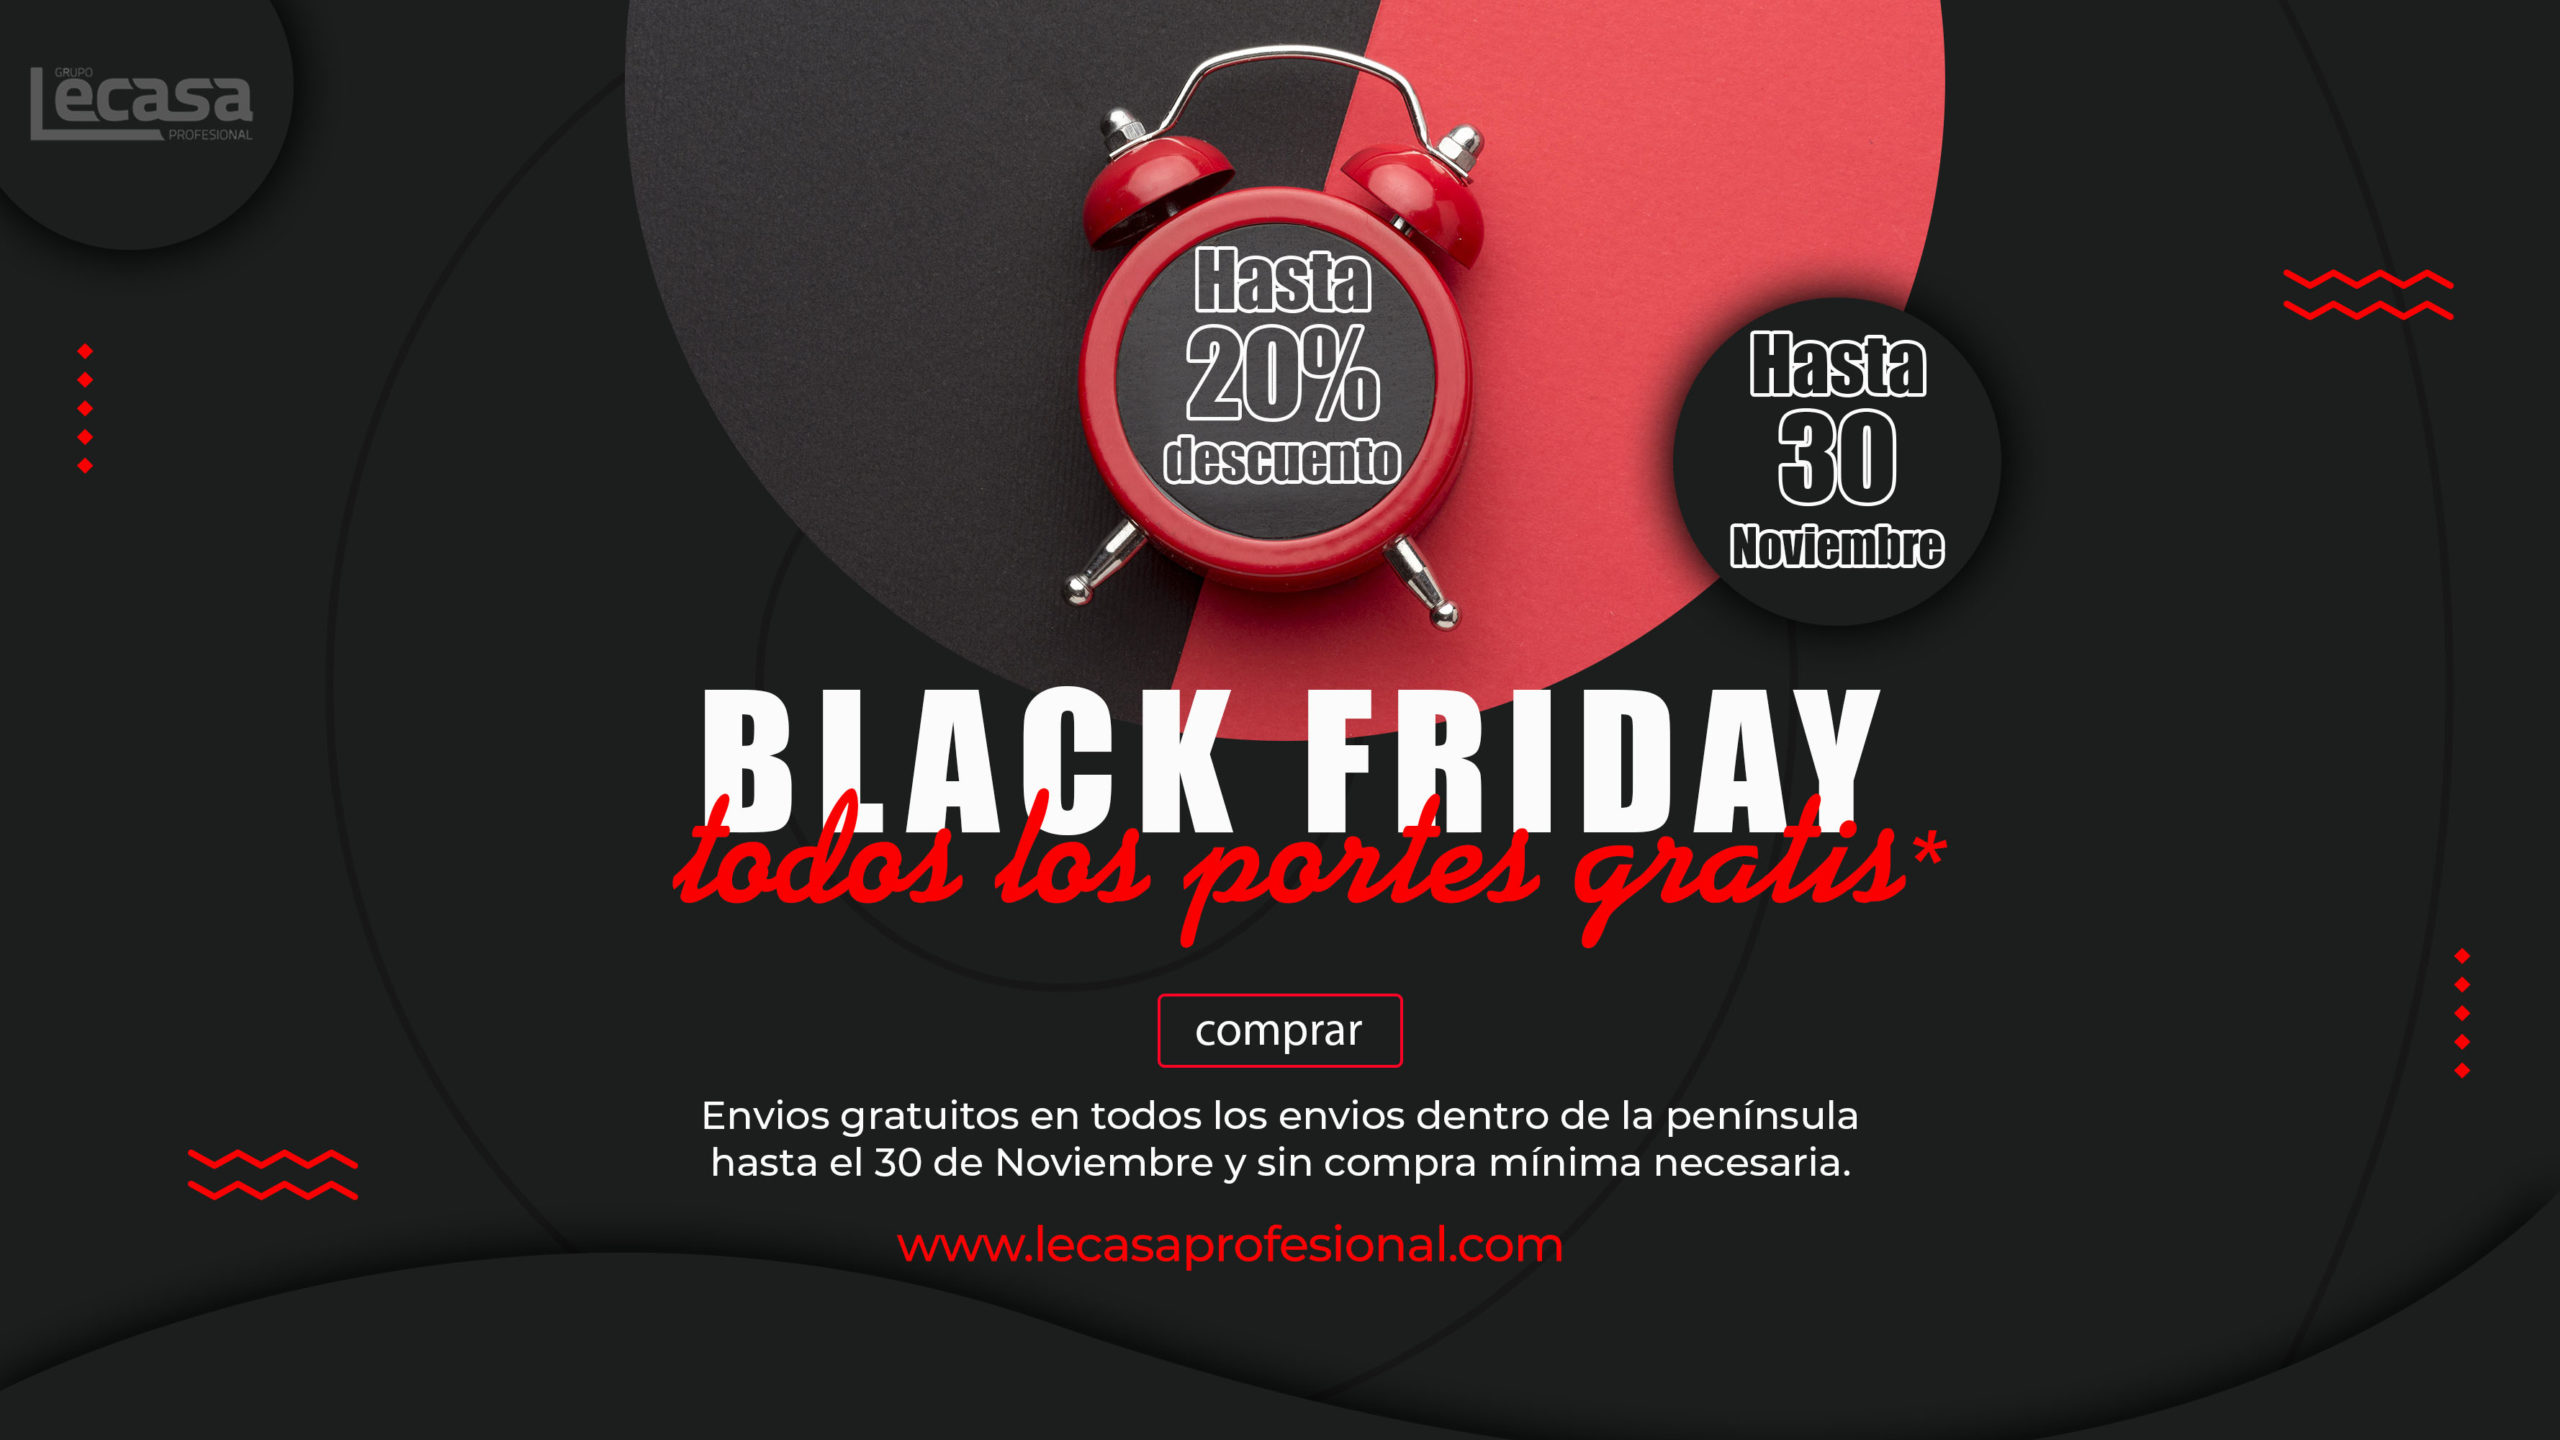 black friday lecasa scaled - Inicio